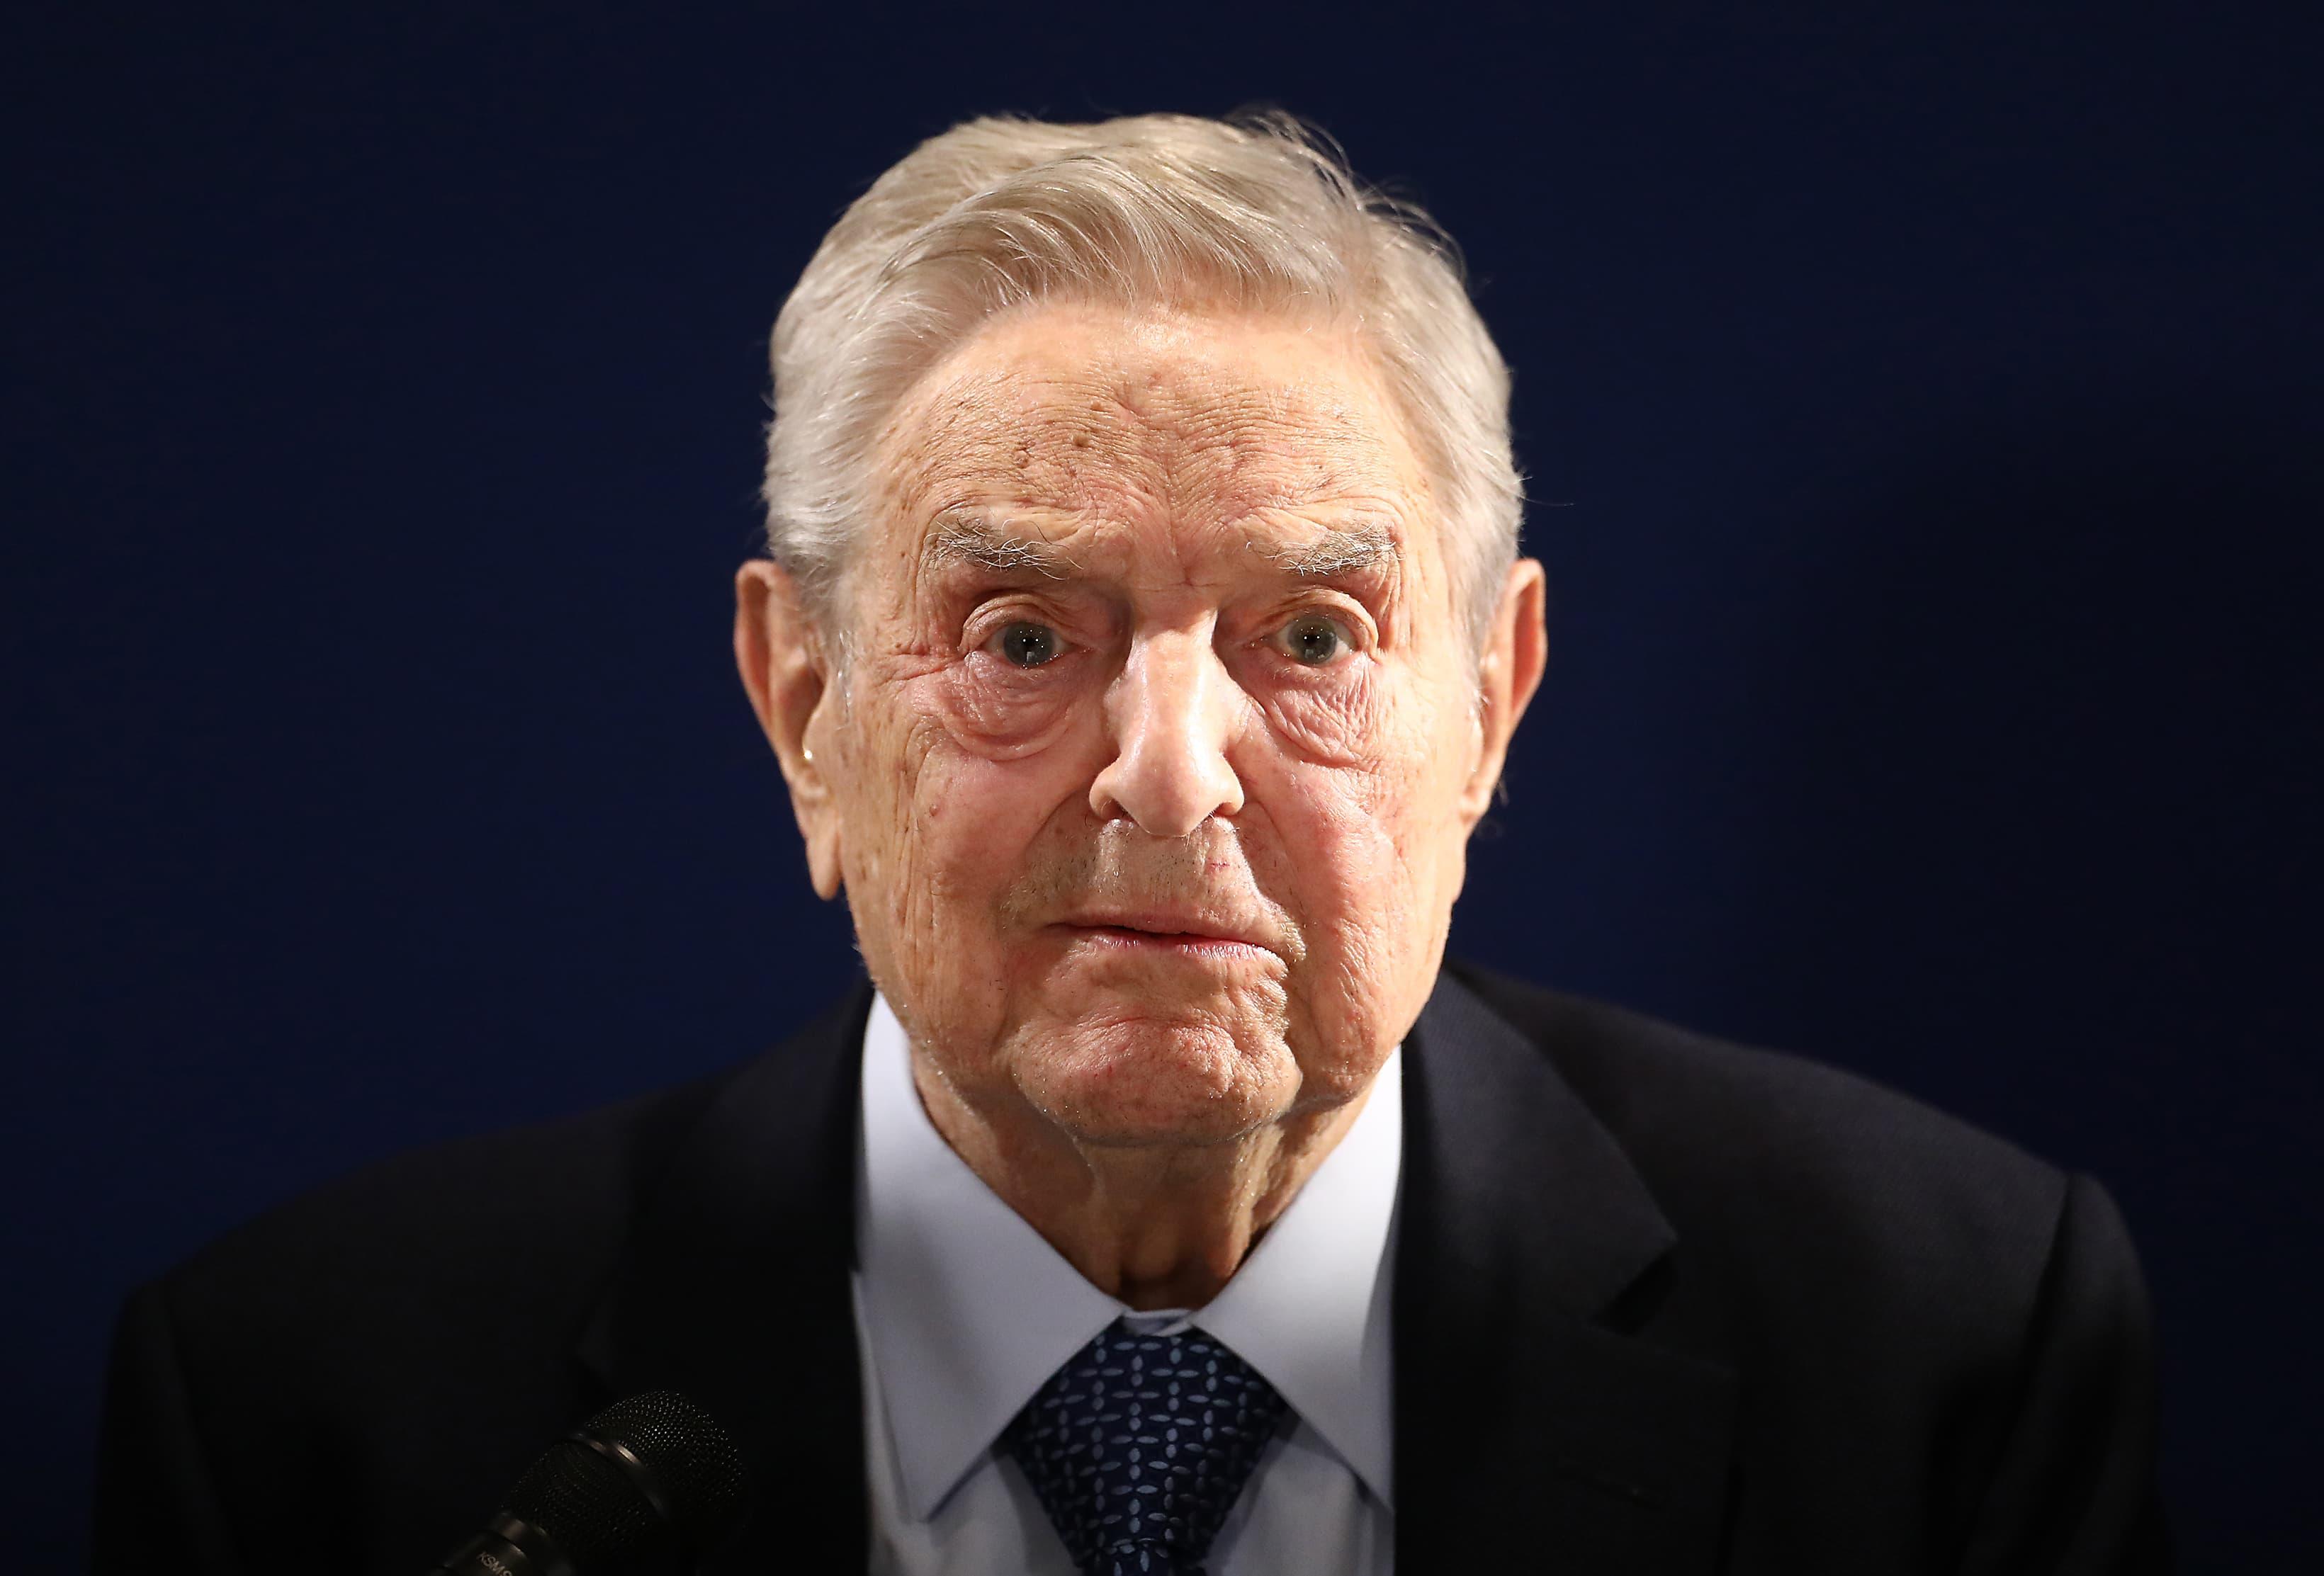 George Soros warns Trump of potential economic doom before election